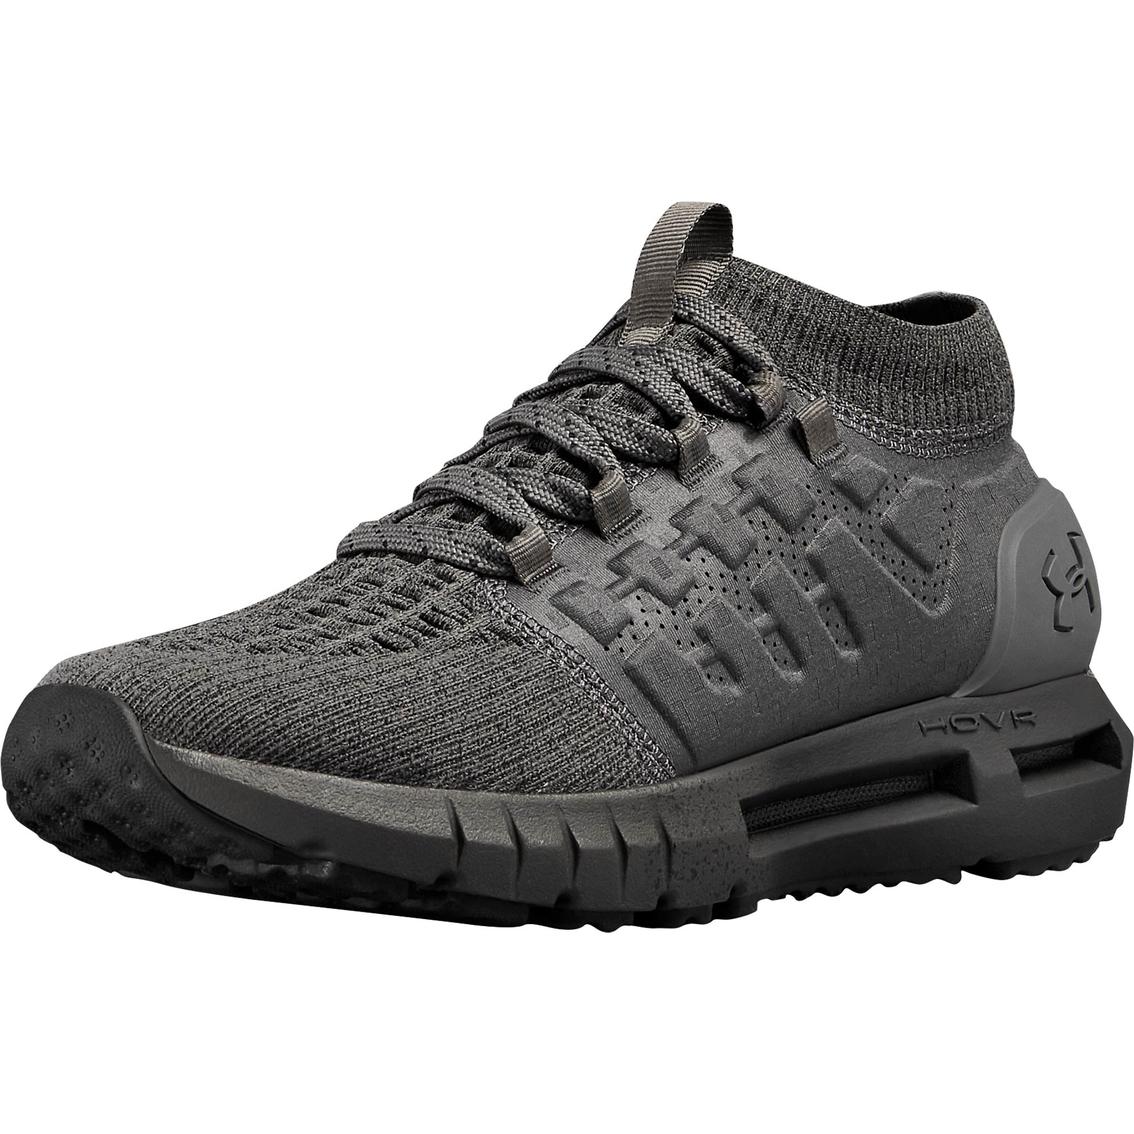 wholesale dealer 90323 bf986 Under Armour Men's Ua Hovr Sonic Running Shoes | Running ...